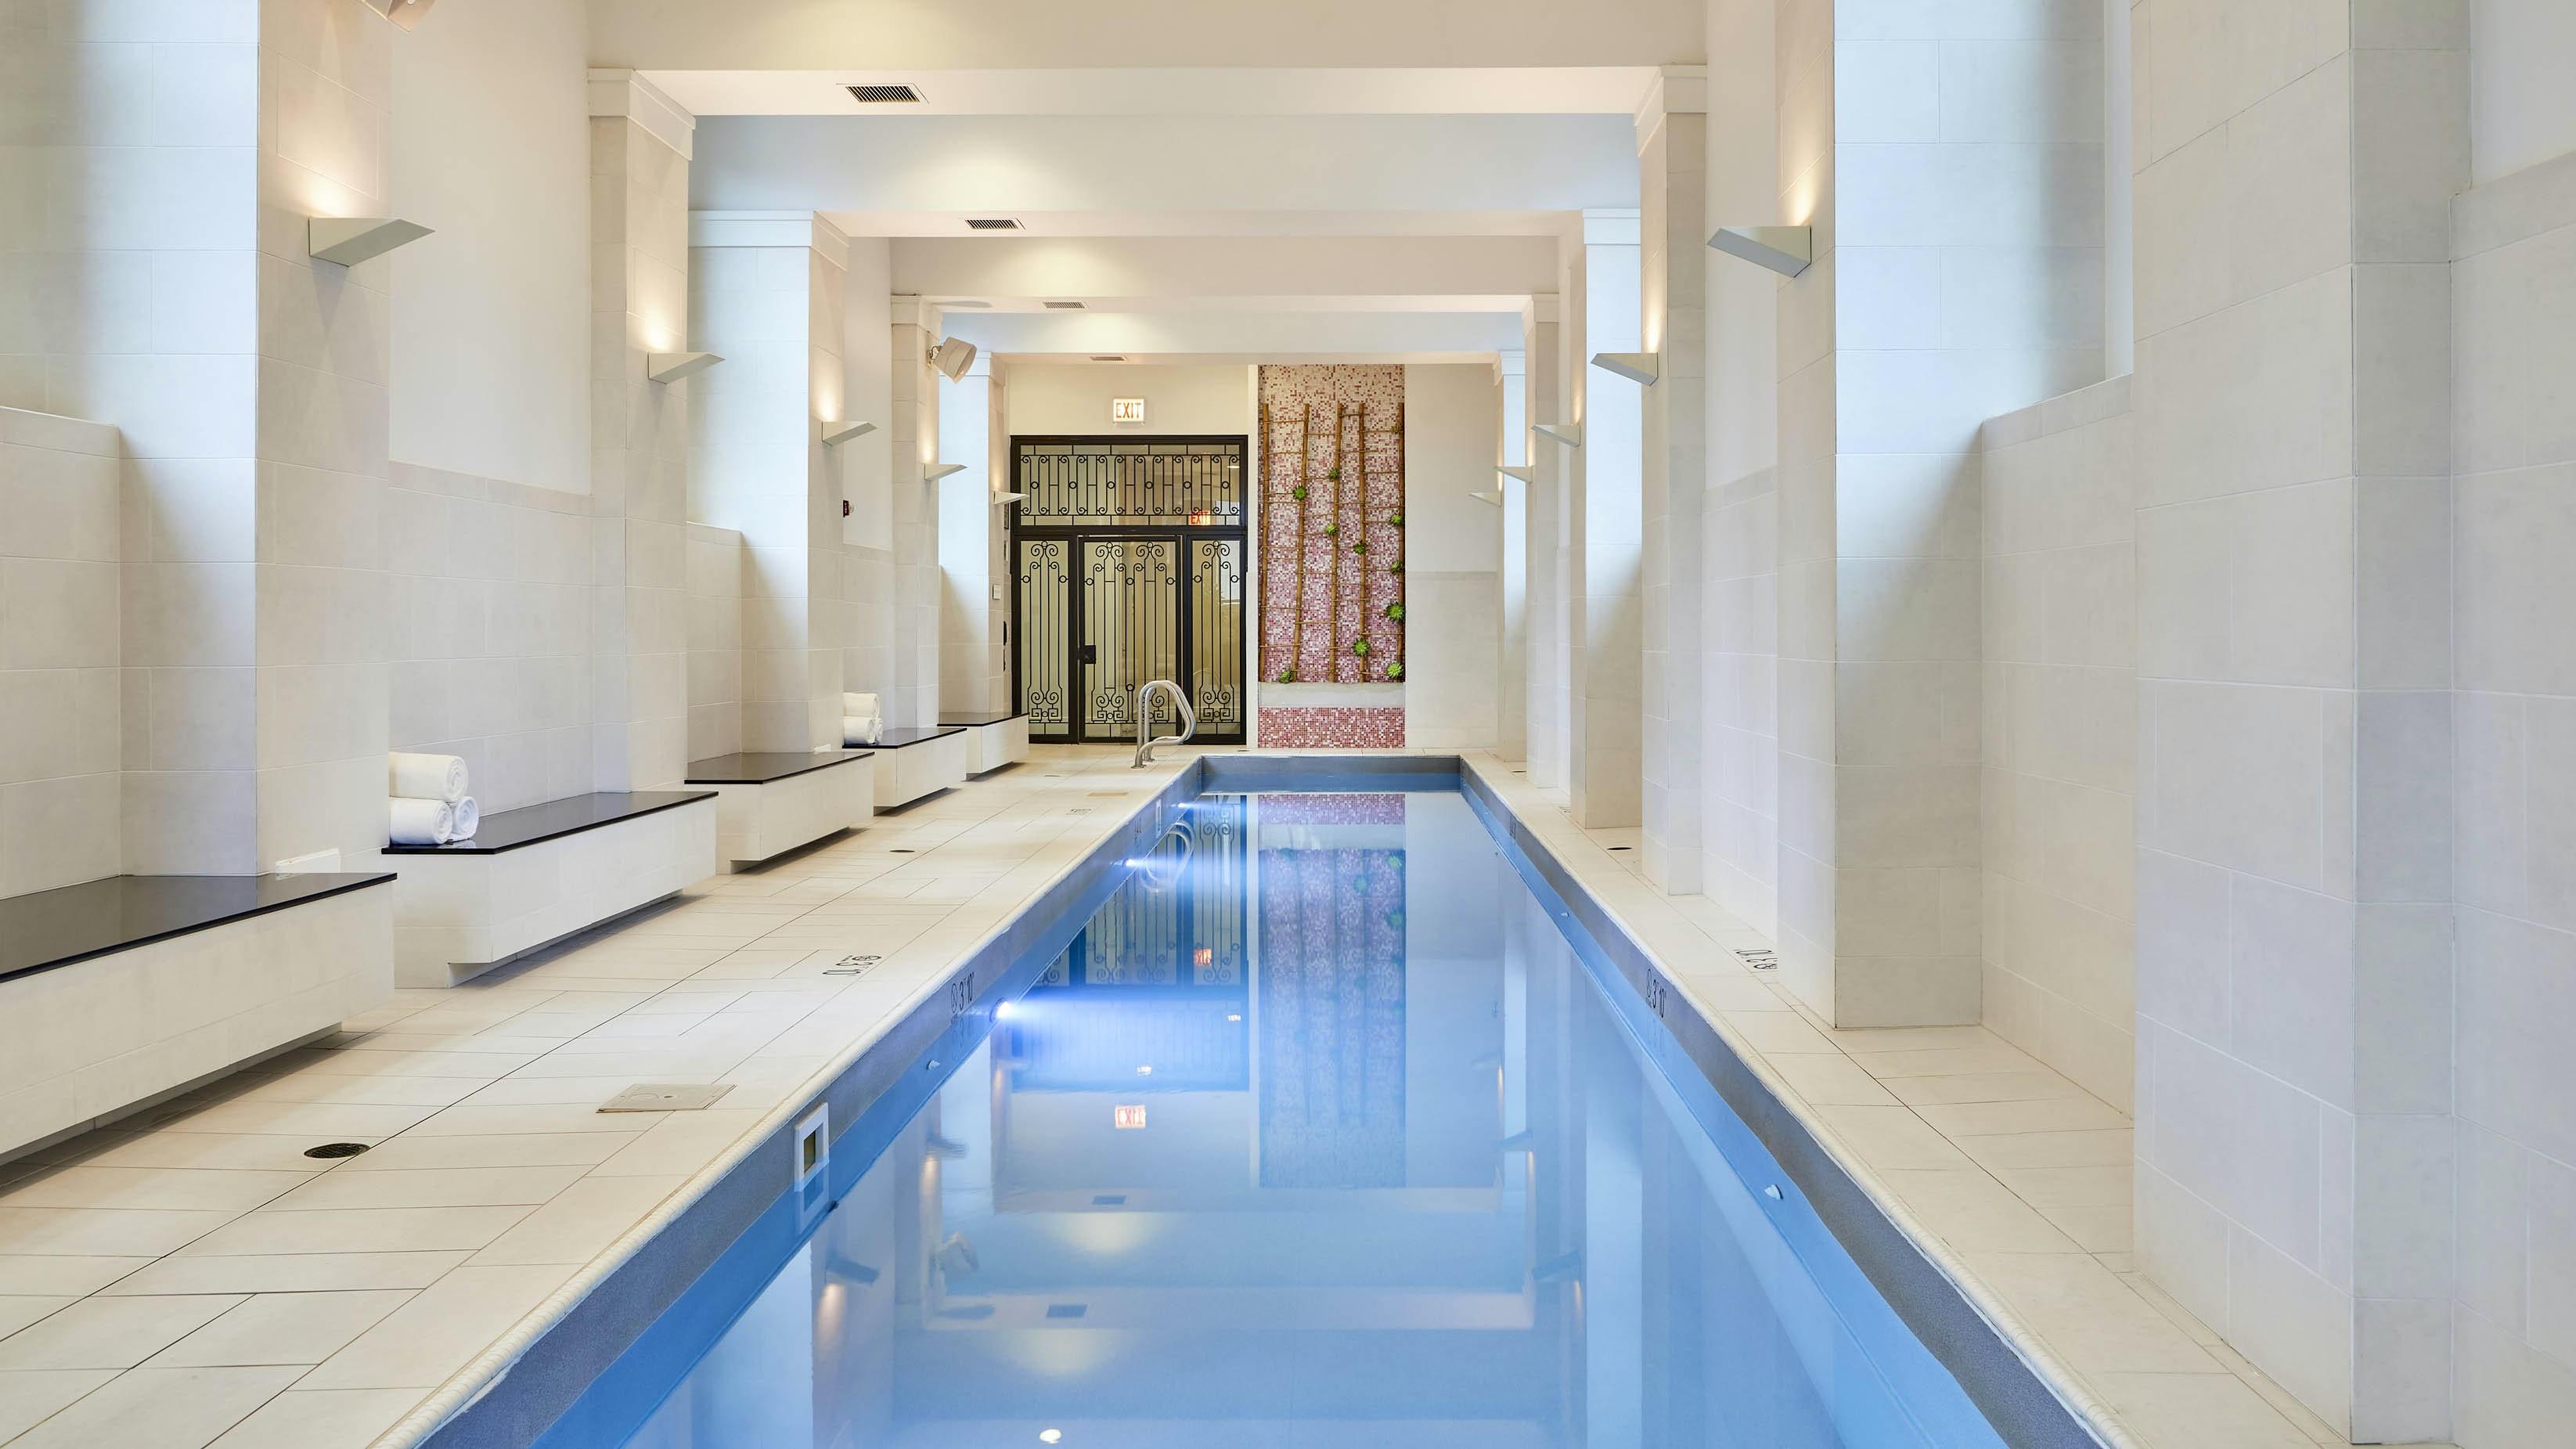 Waldorf-Astoria Spa & Health Club